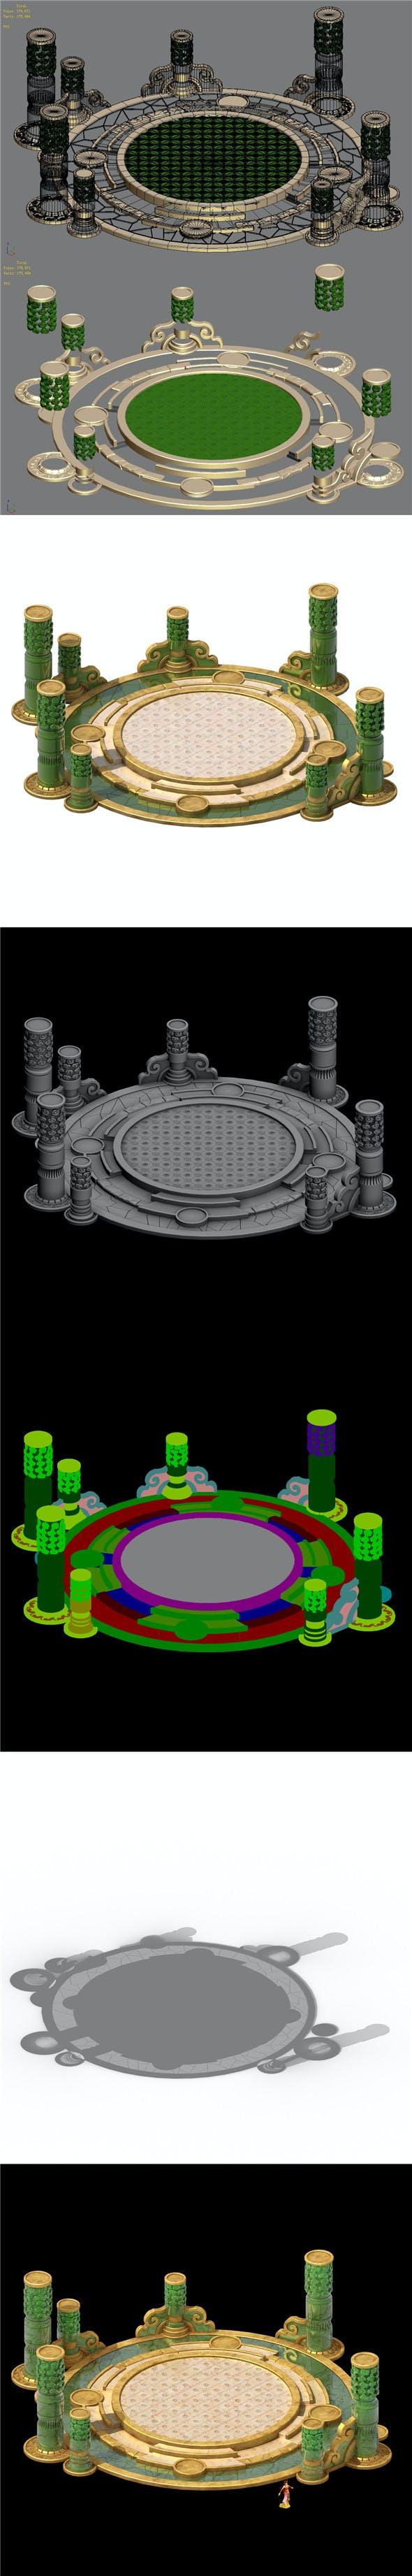 Building platform - round city center decoration - 3DOcean Item for Sale